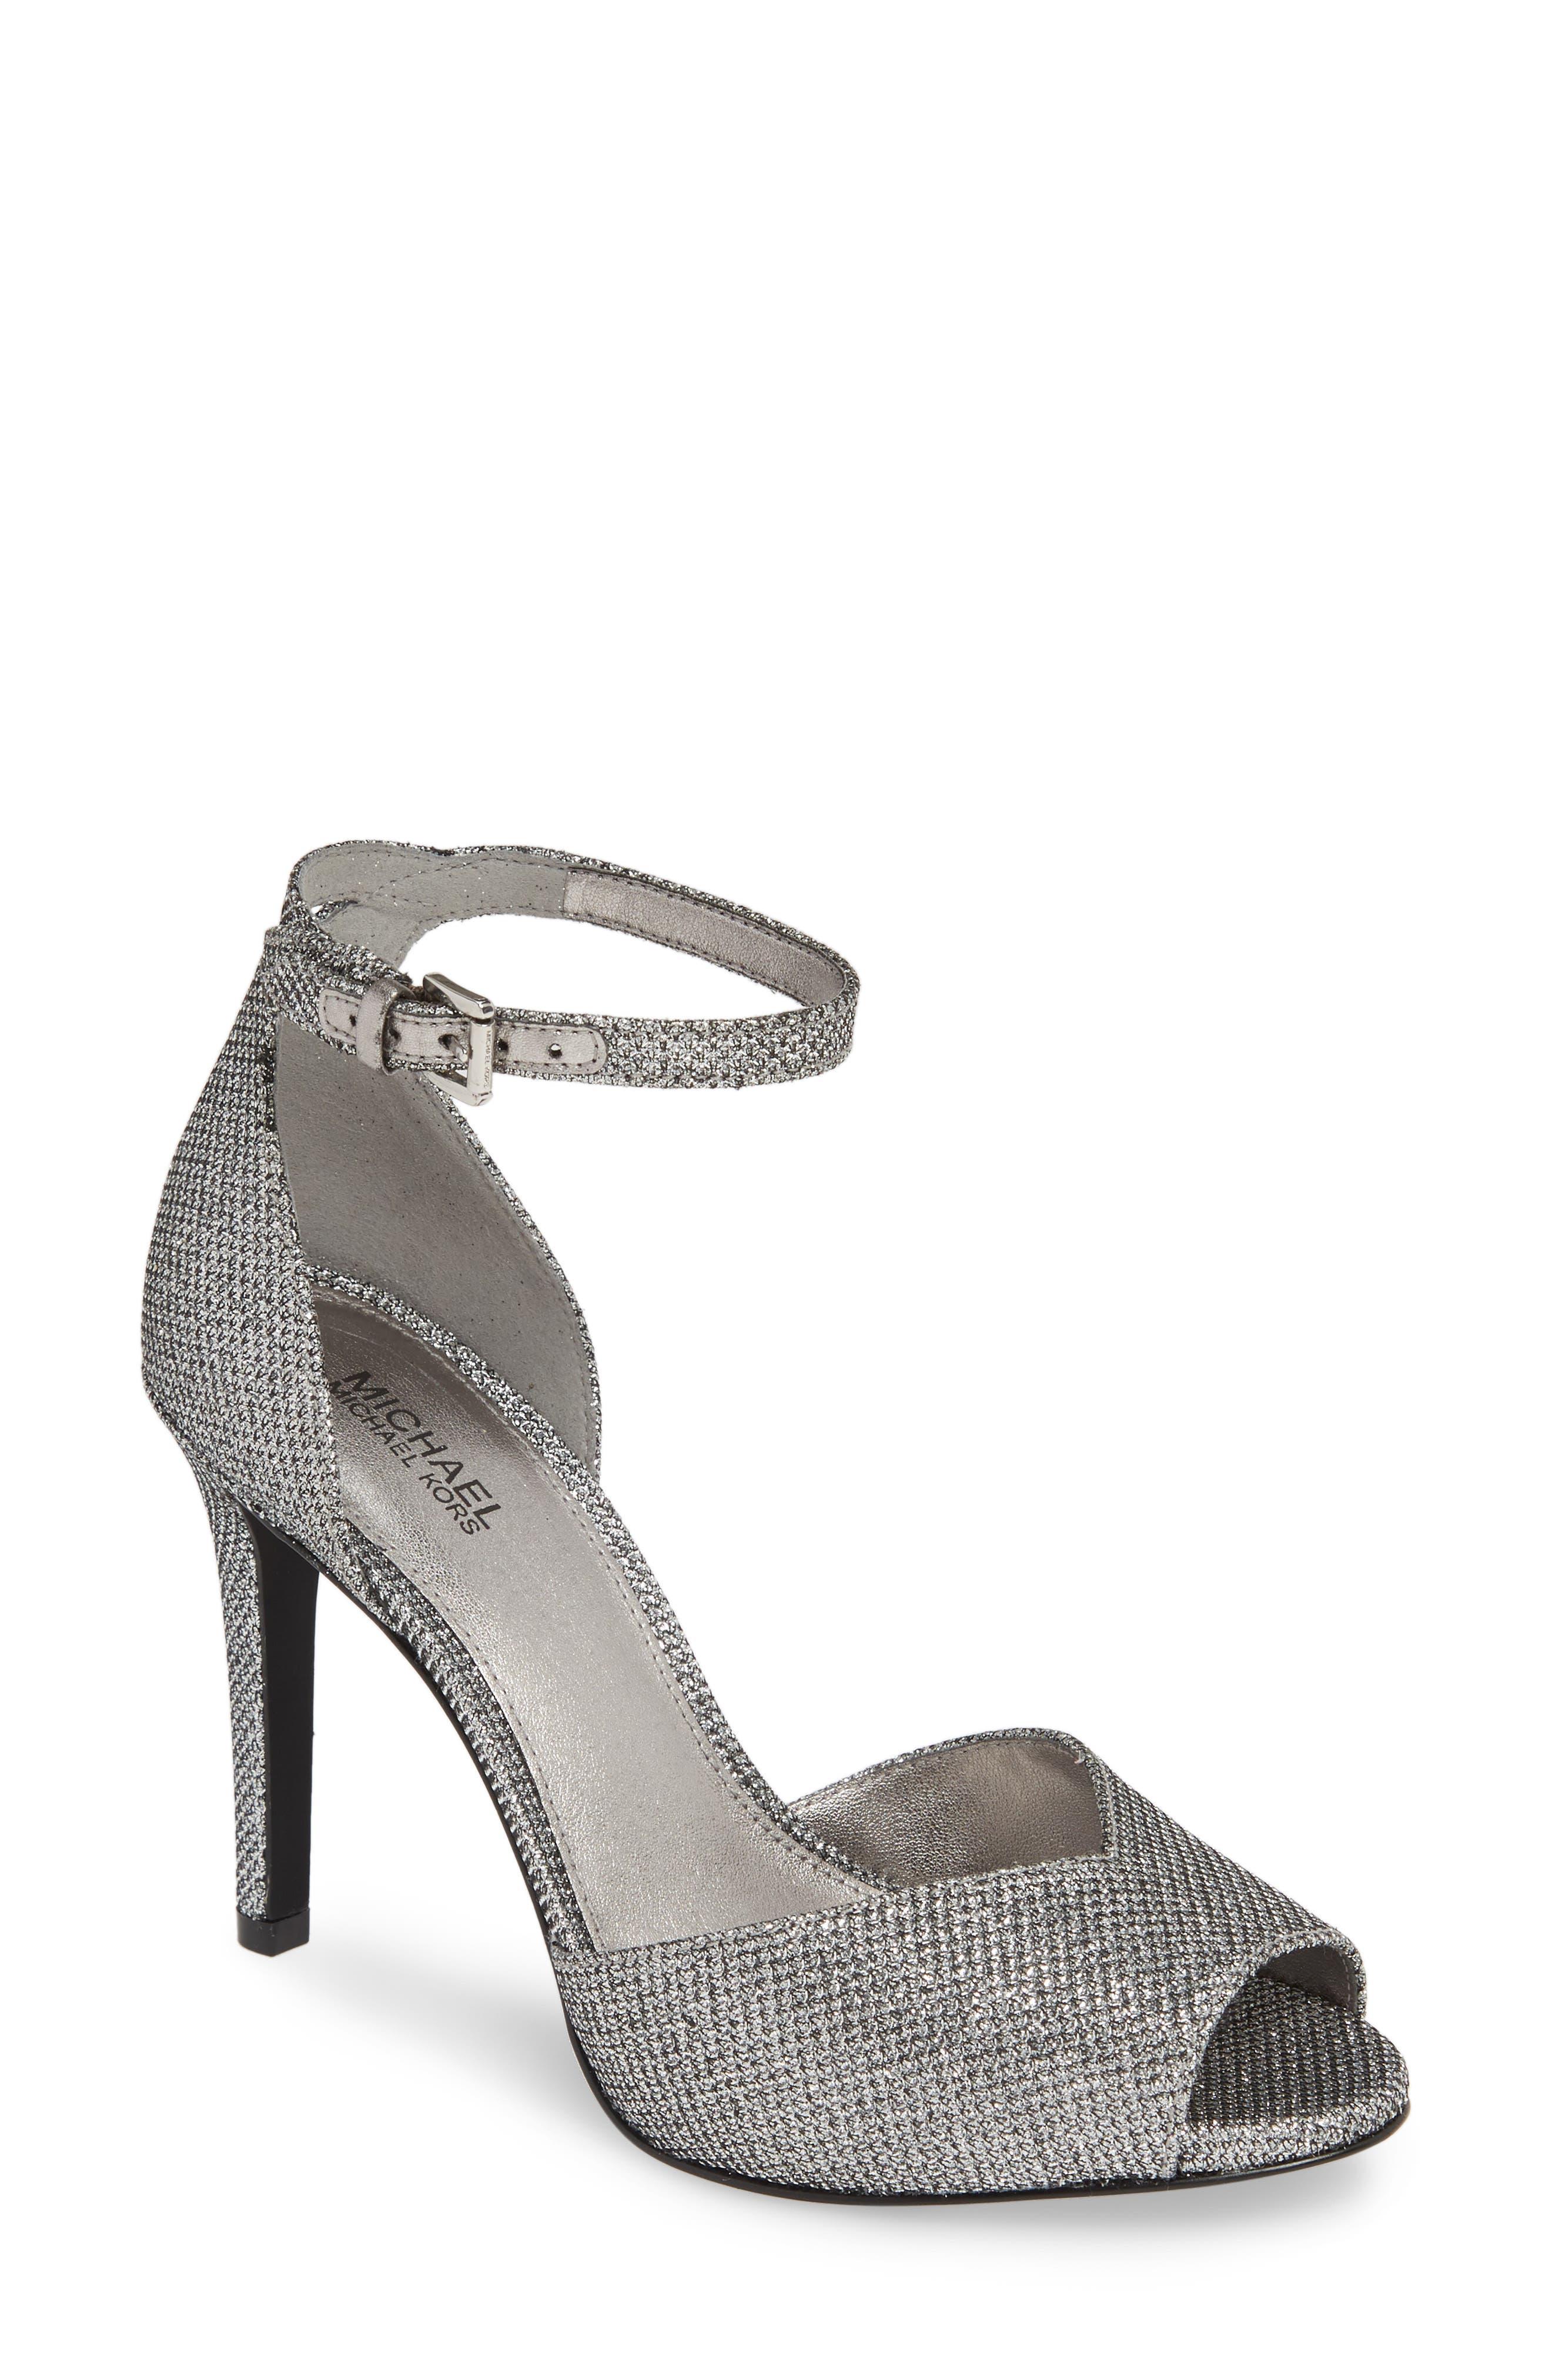 Michael Michael Kors Cambria Metallic Ankle Strap Sandal- Metallic